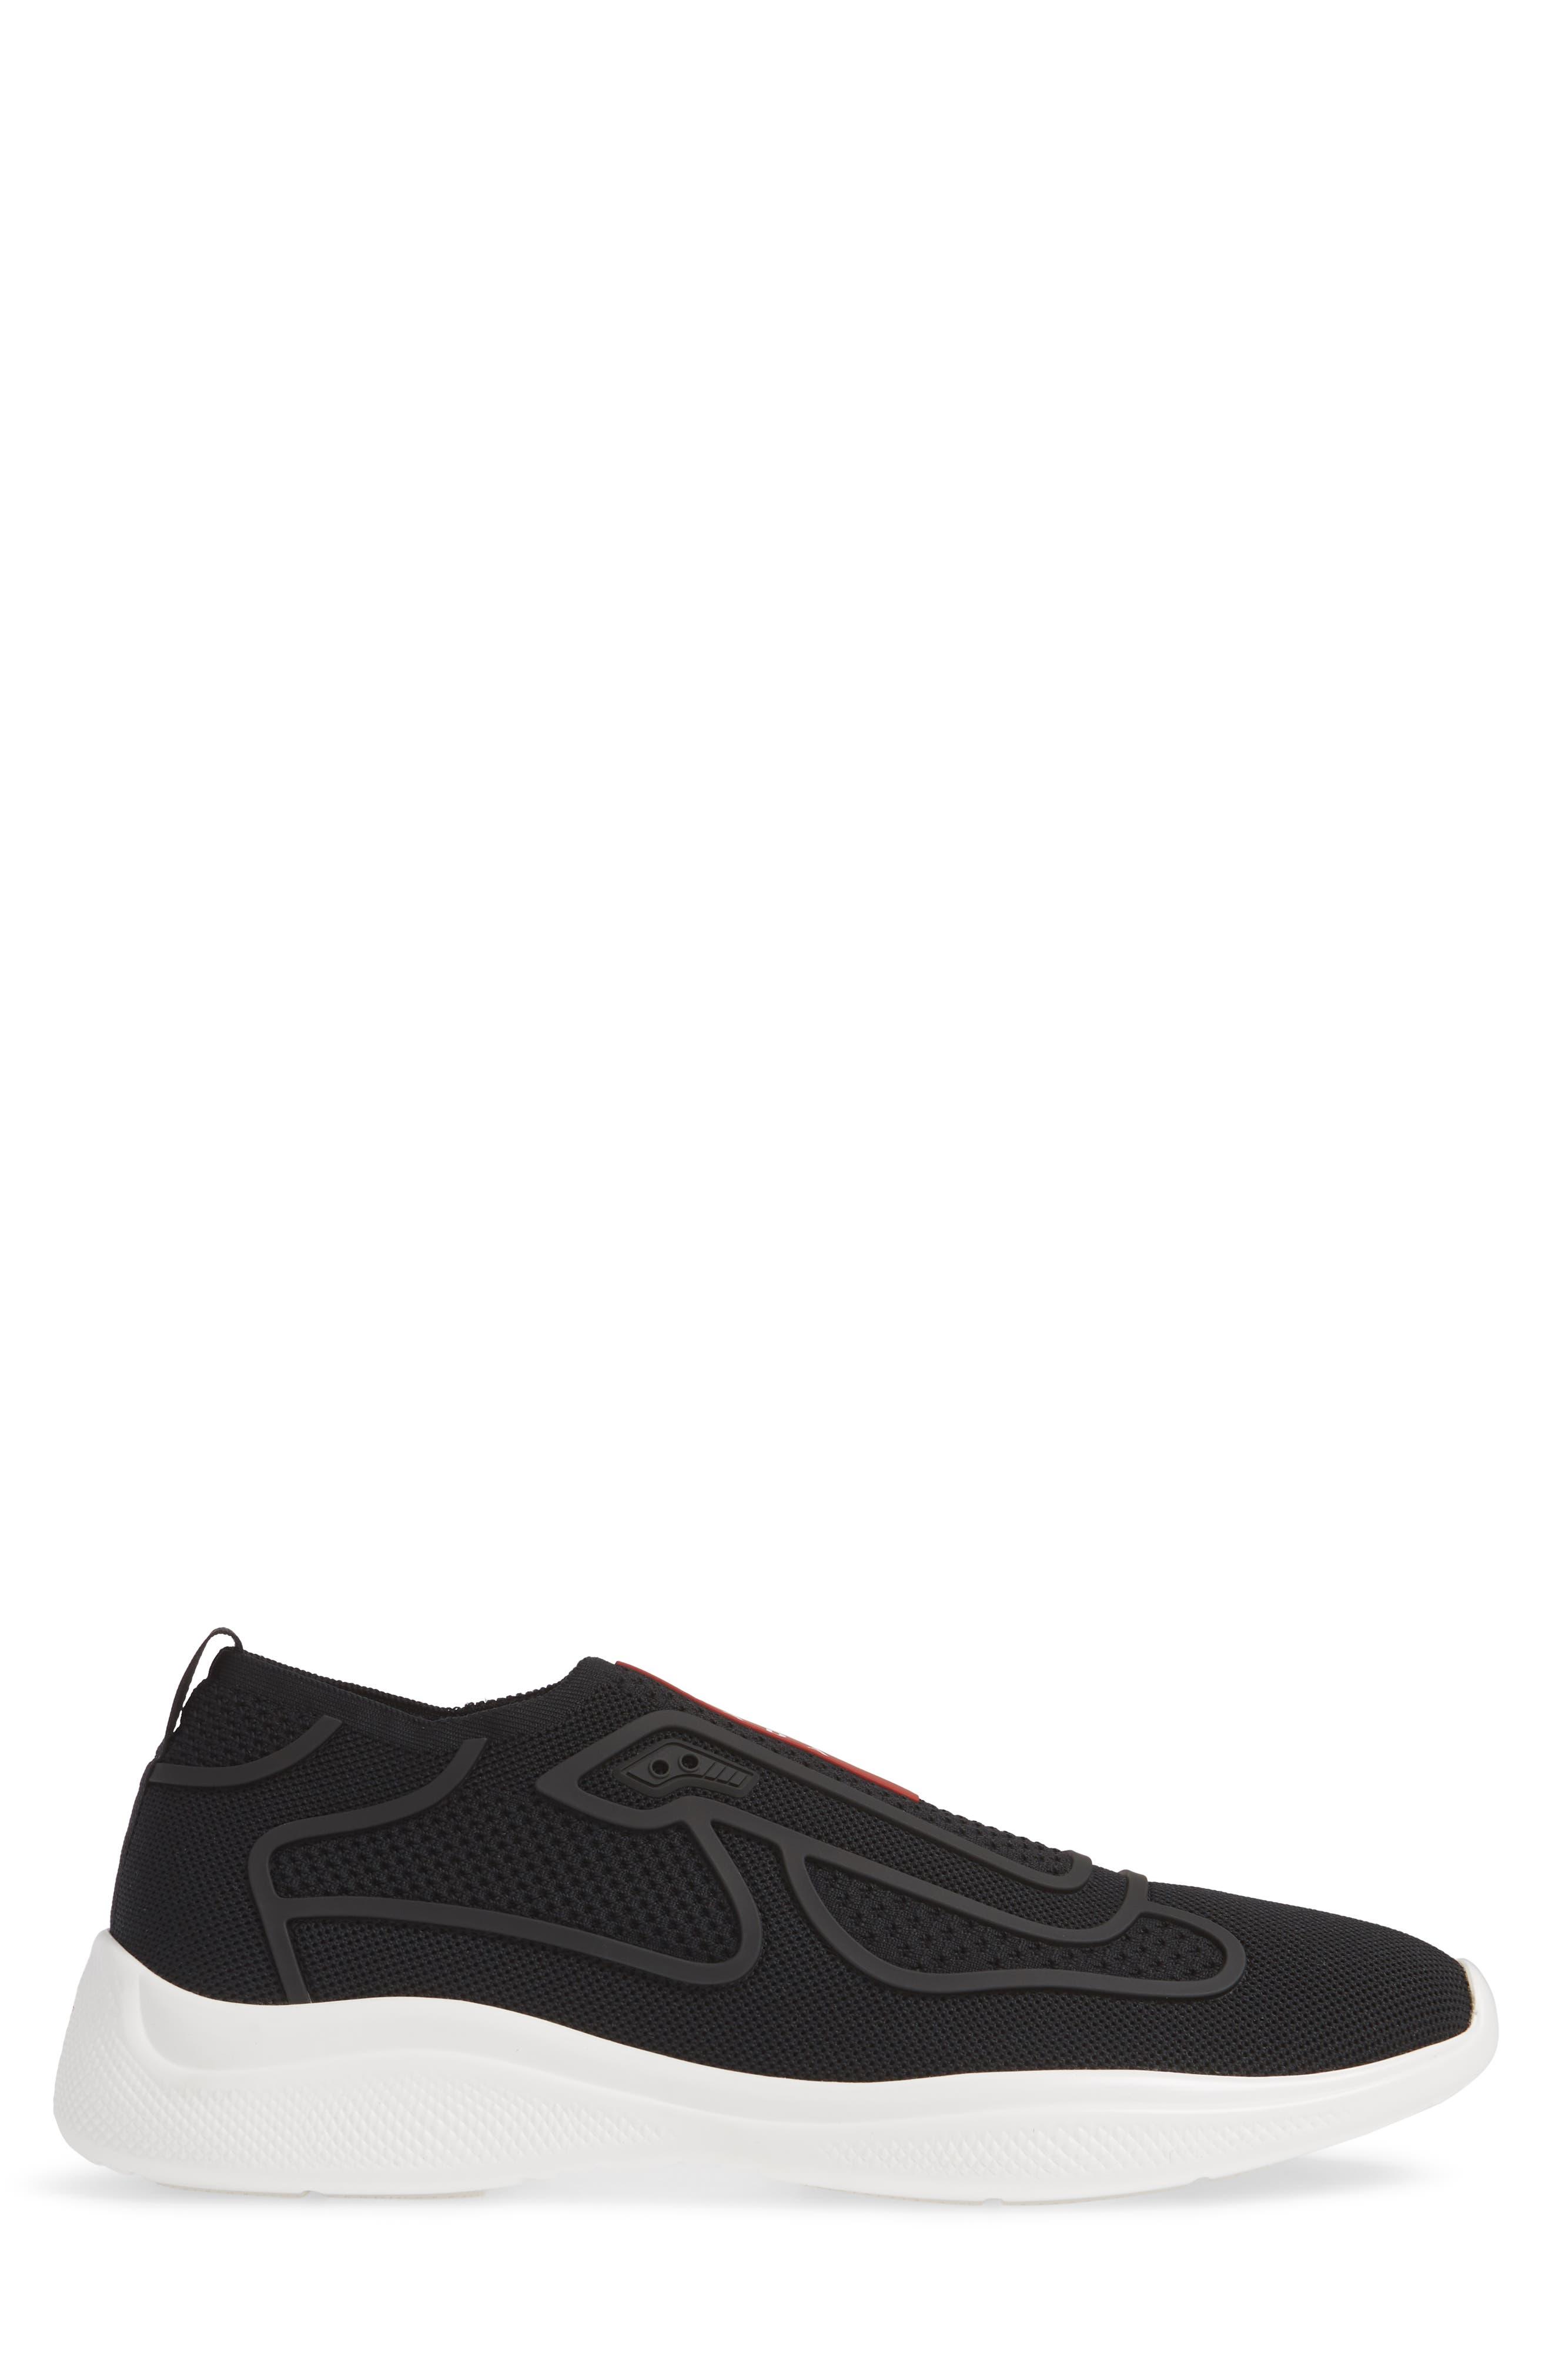 PRADA,                             Laceless Logo Sneaker,                             Alternate thumbnail 3, color,                             NERO